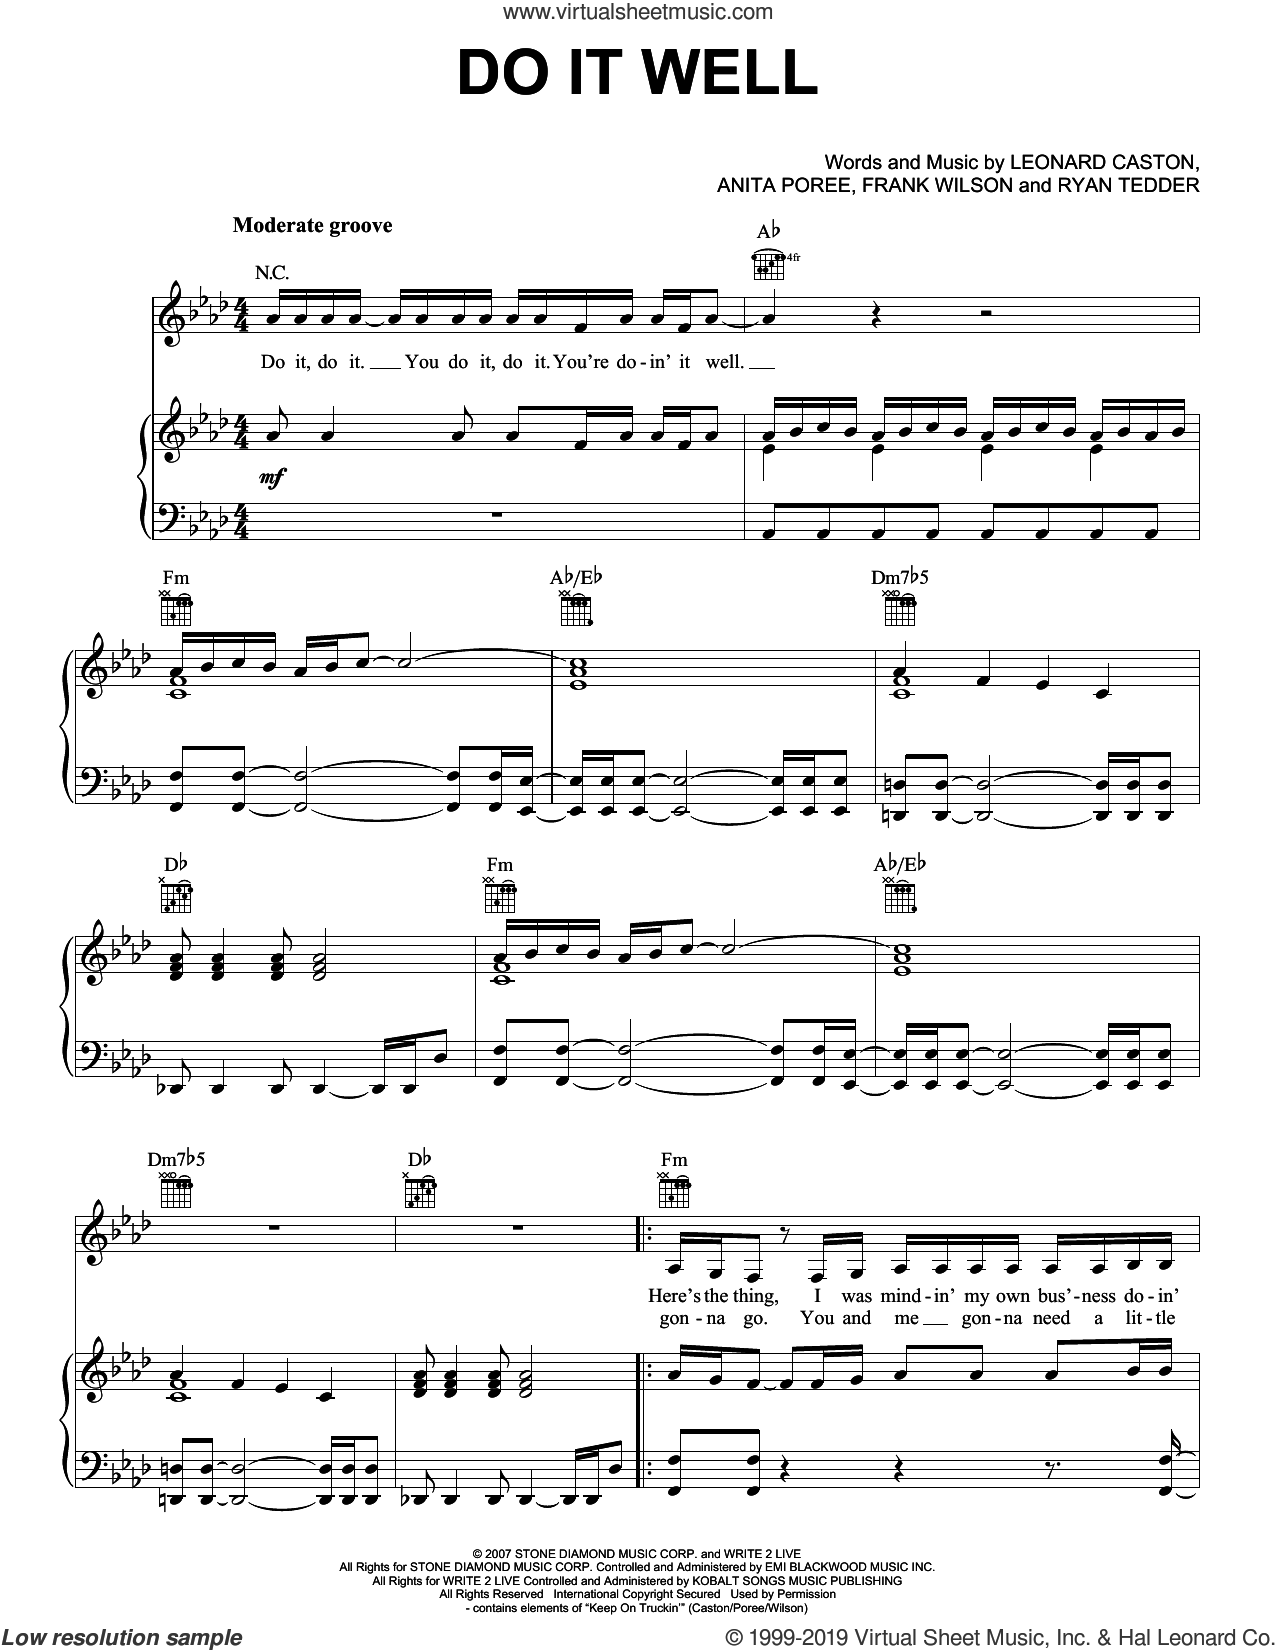 Do It Well sheet music for voice, piano or guitar by Jennifer Lopez, Anita Poree, Frank Wilson, Leonard Caston and Ryan Tedder, intermediate skill level